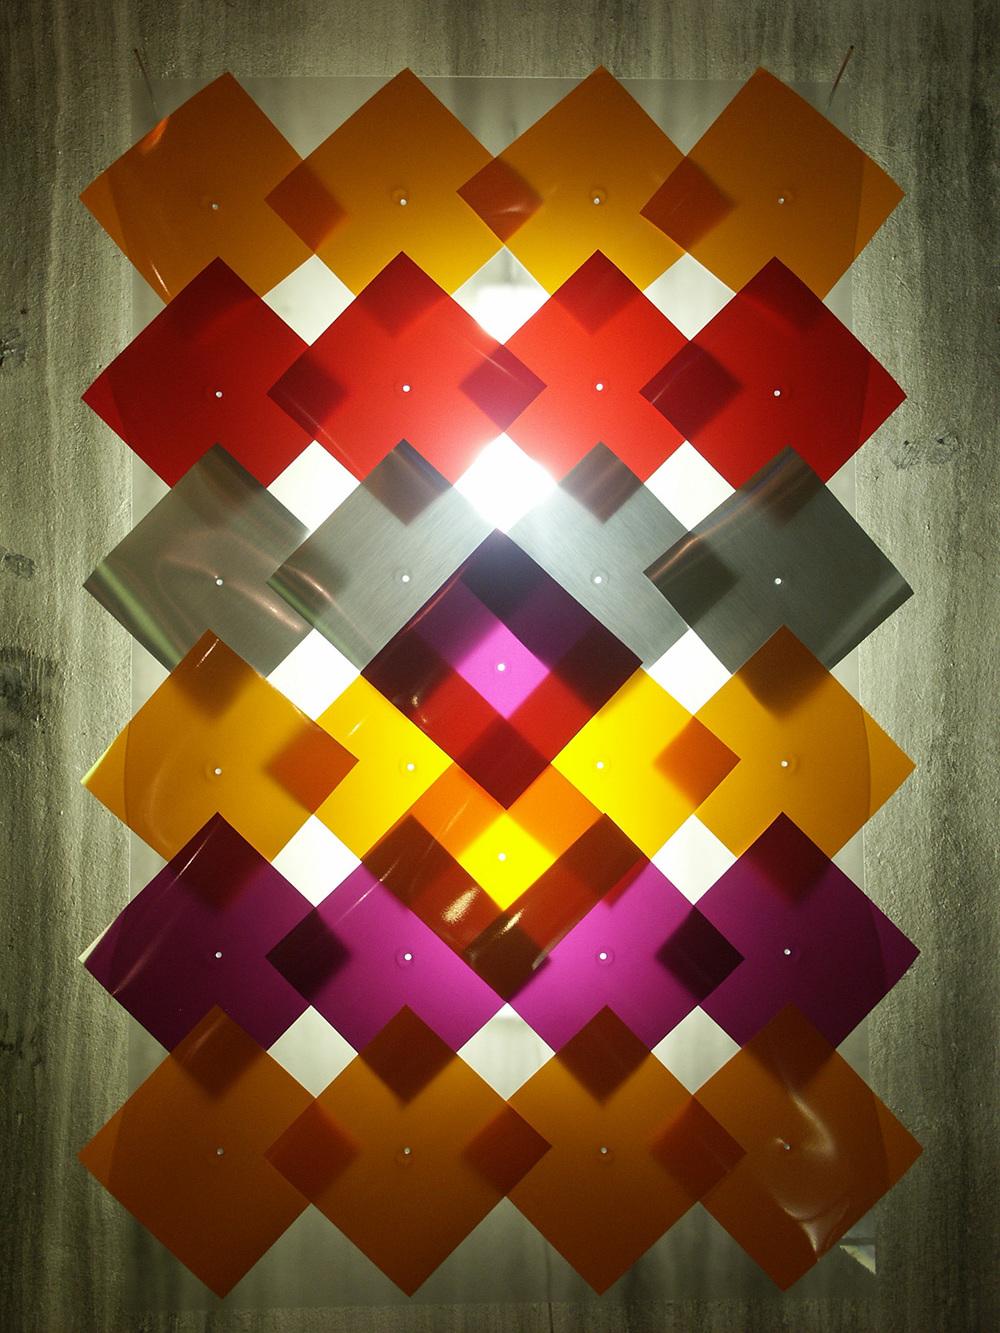 Freydenberg_Trans_Square_7.jpg